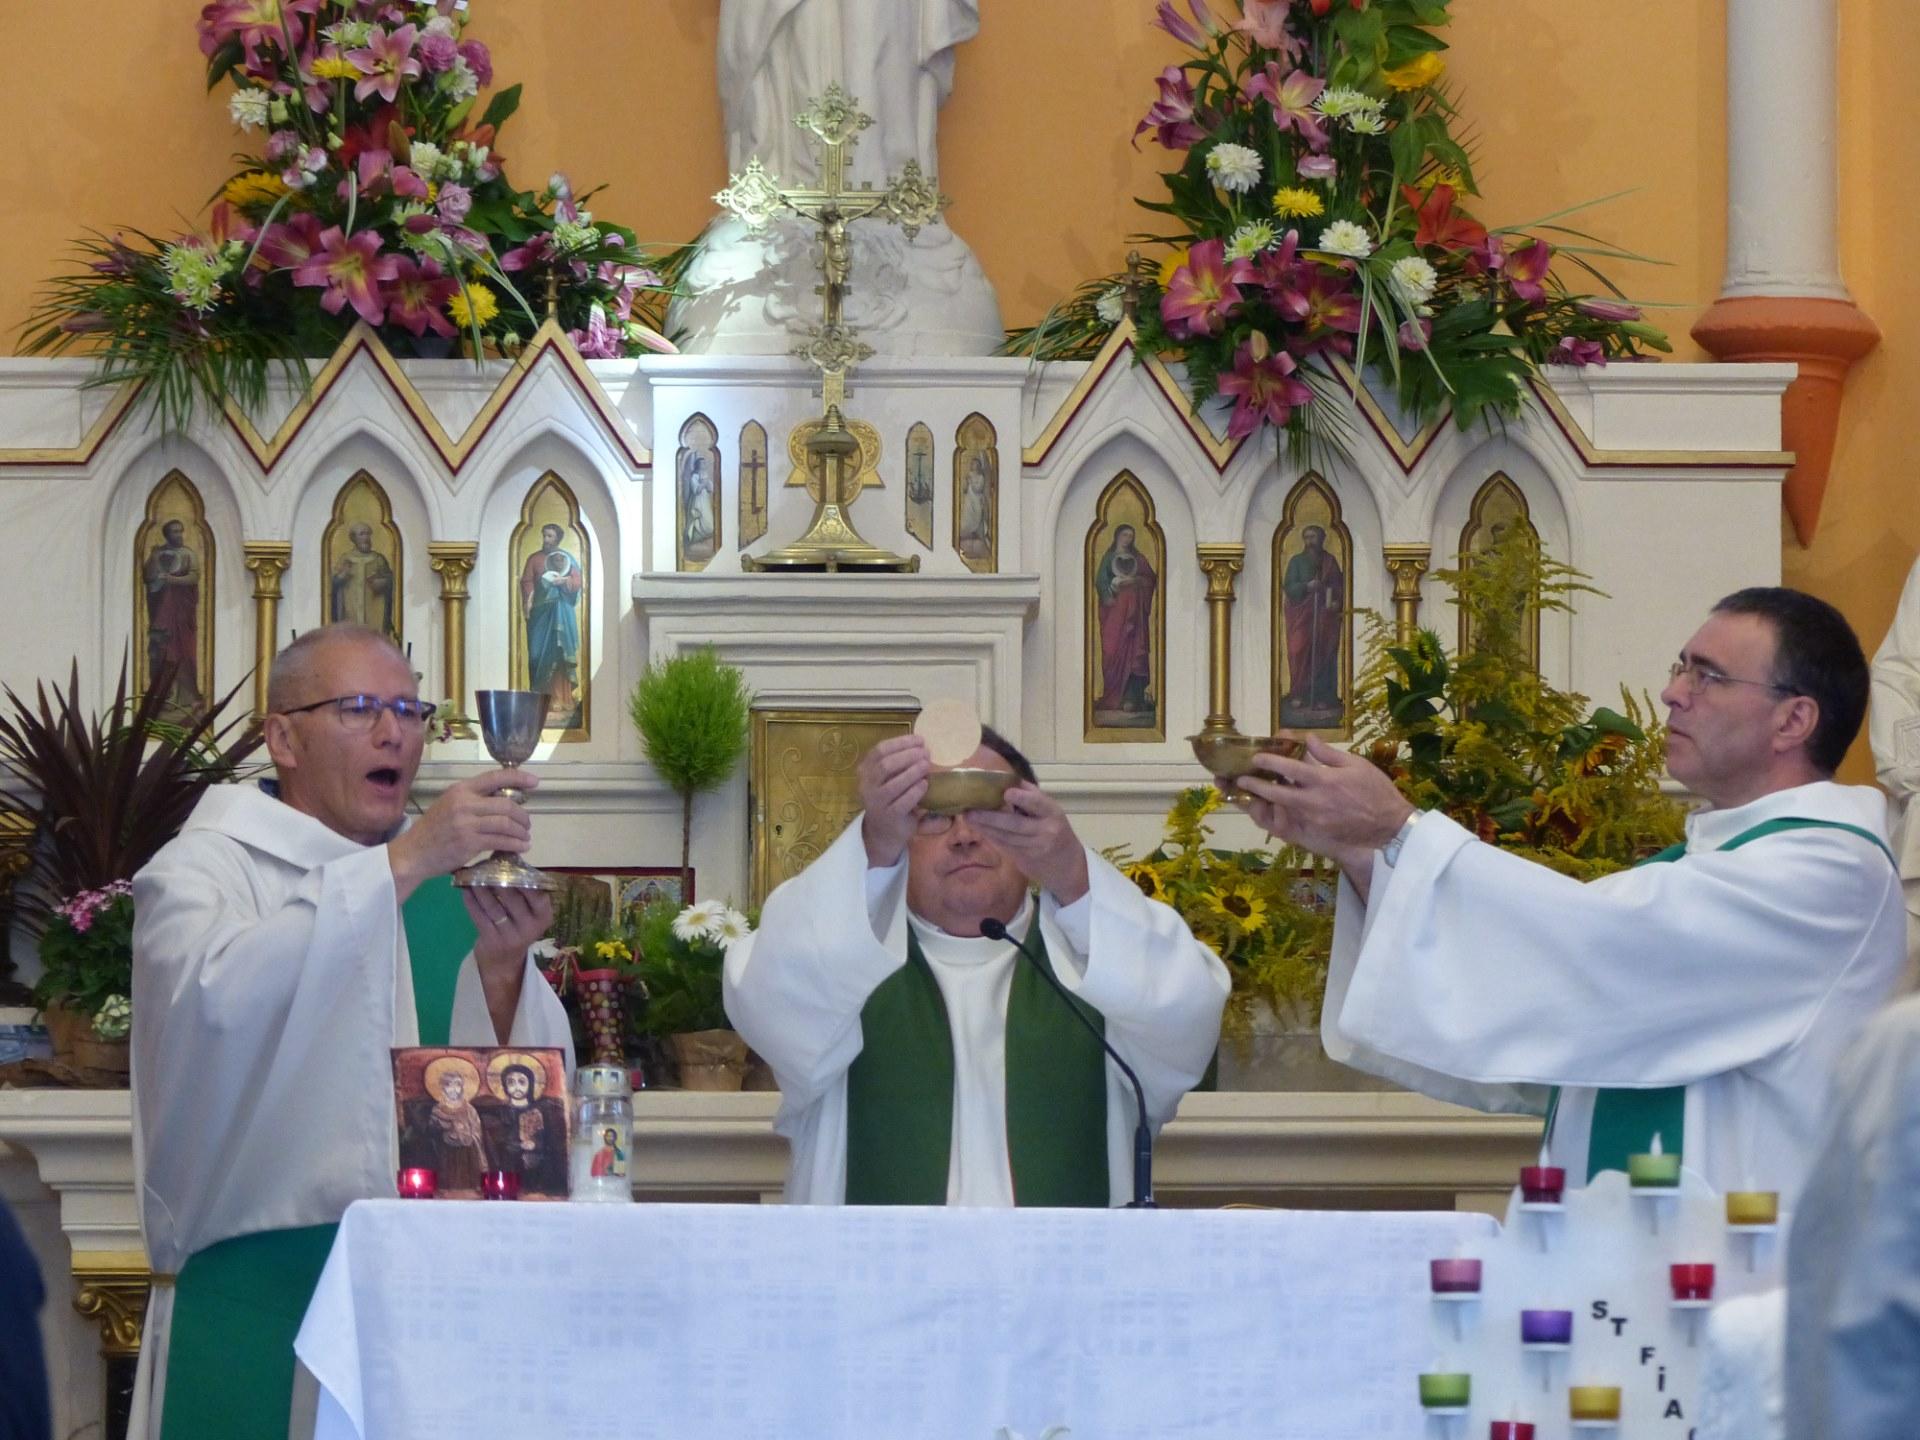 St Fiacre 51